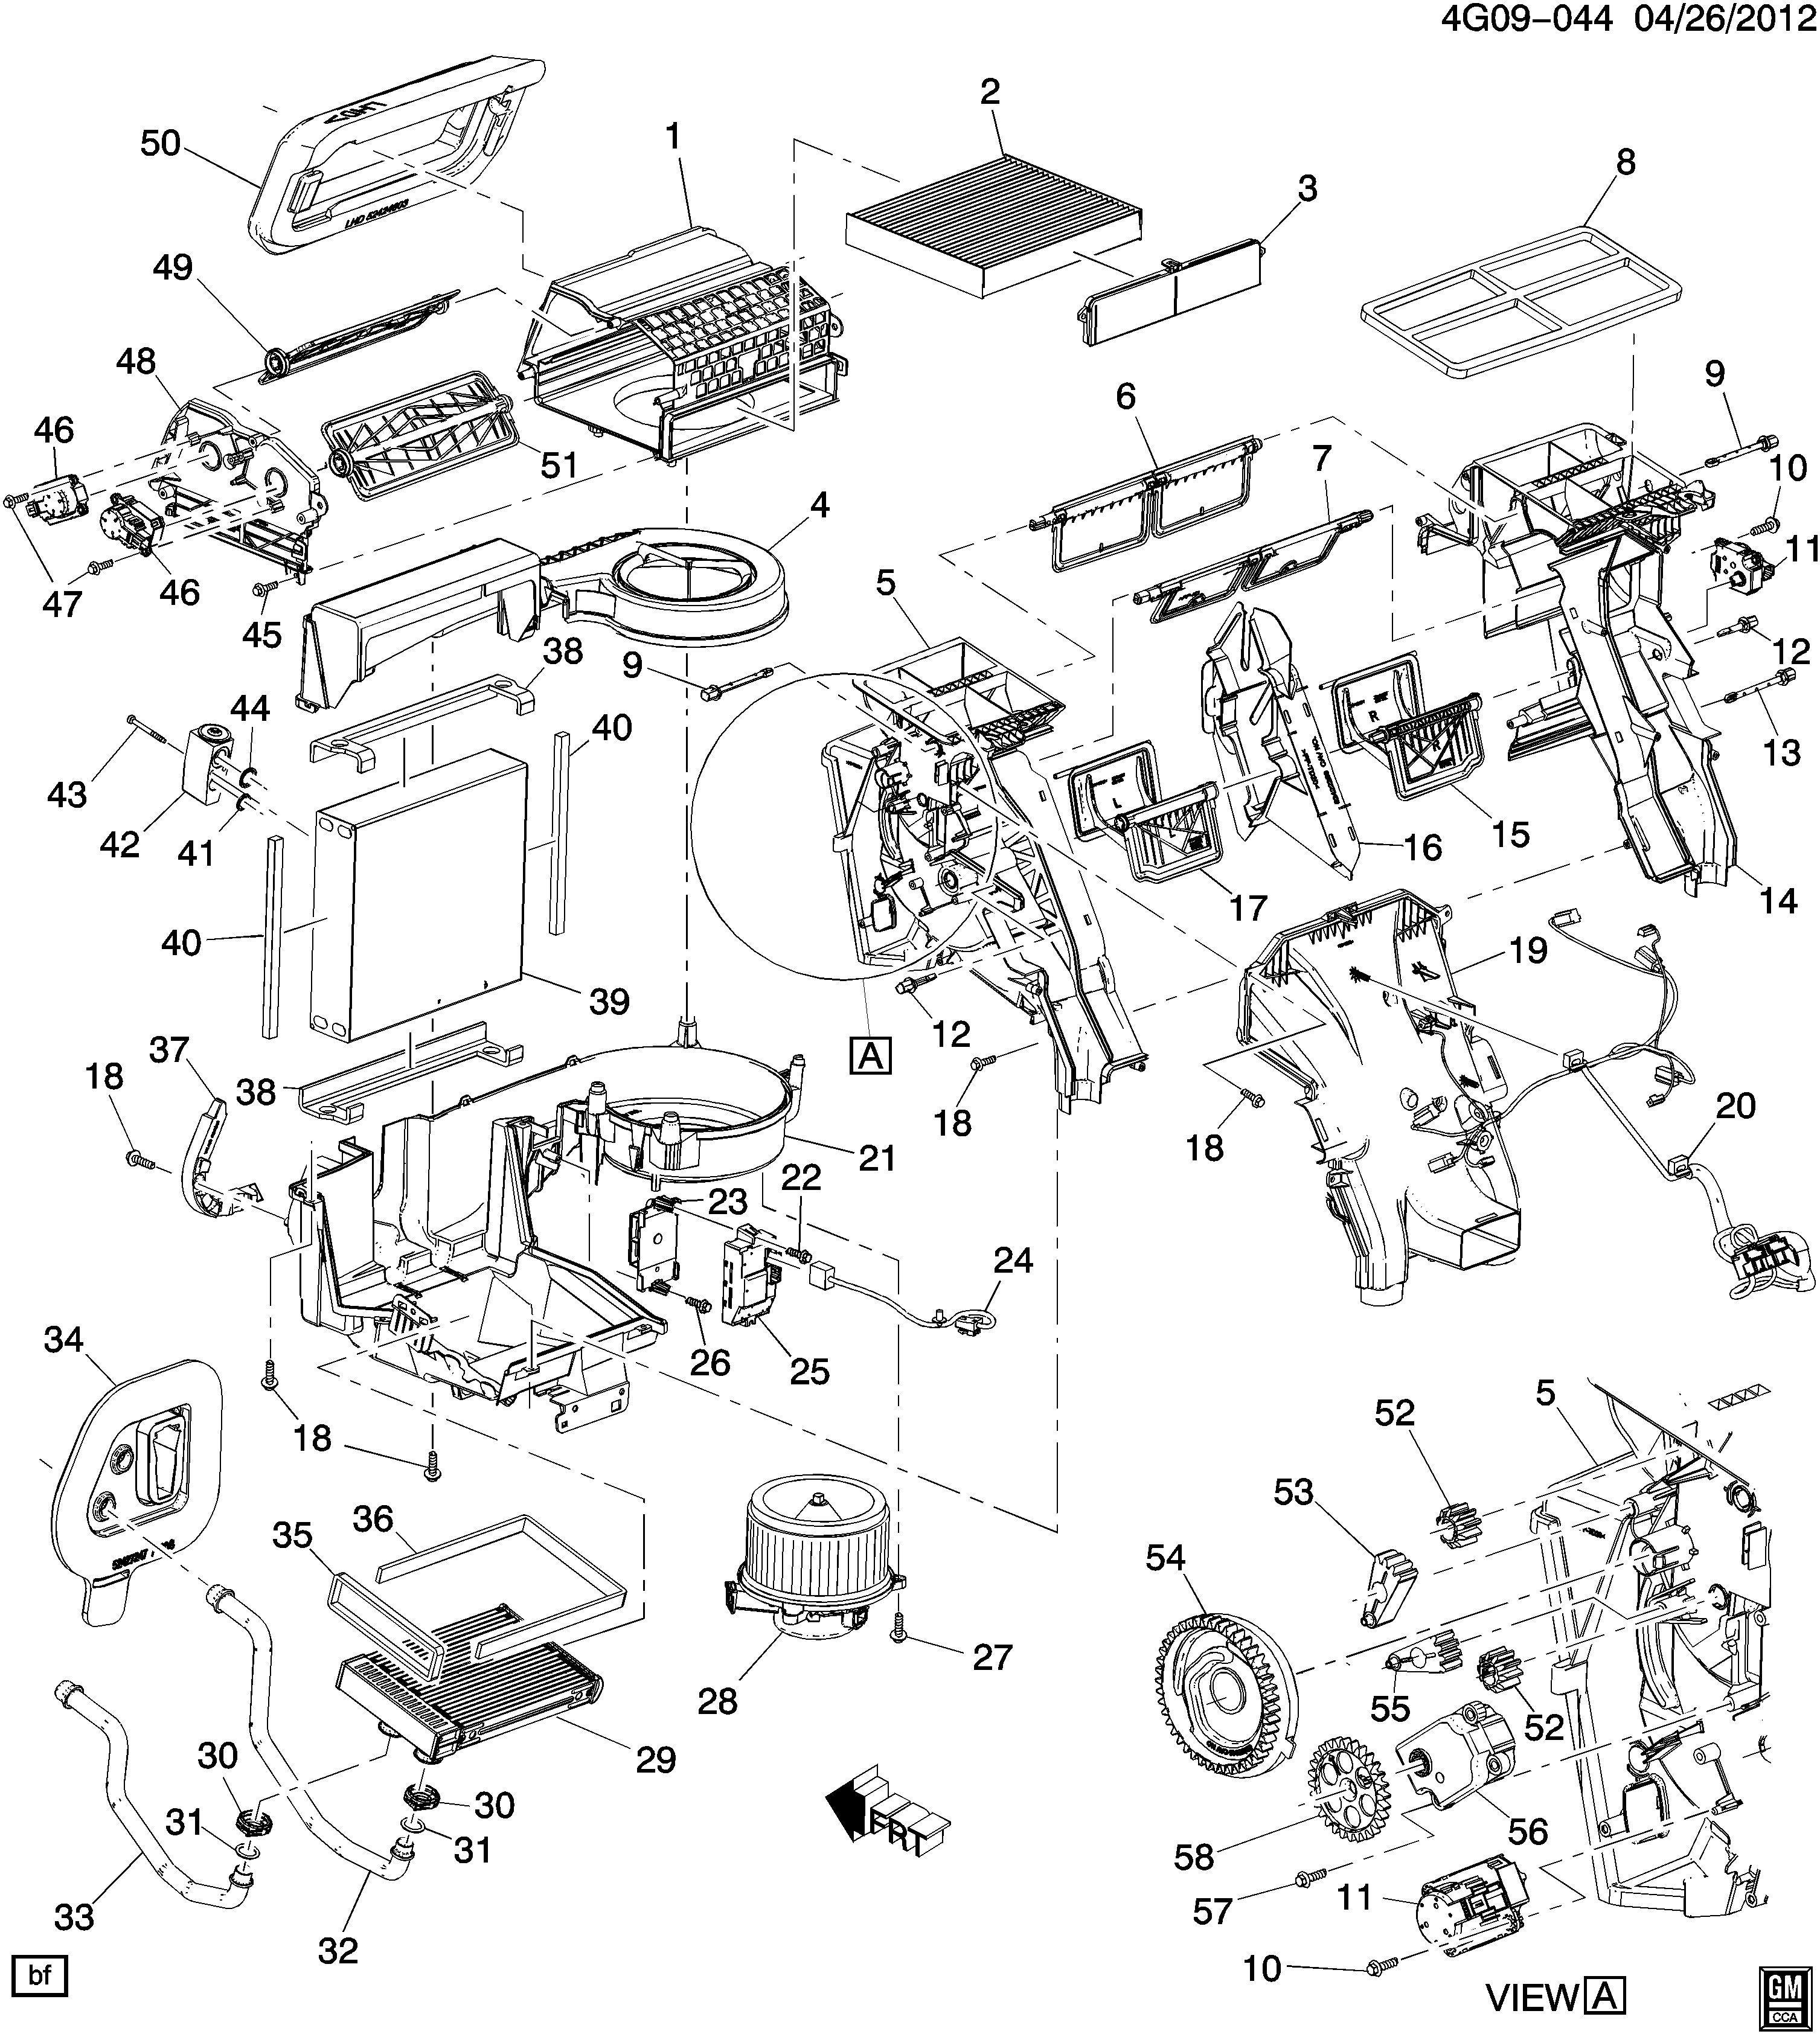 Chevrolet Malibu Bolt; seal. Boltblo, bolthtr, boltmode